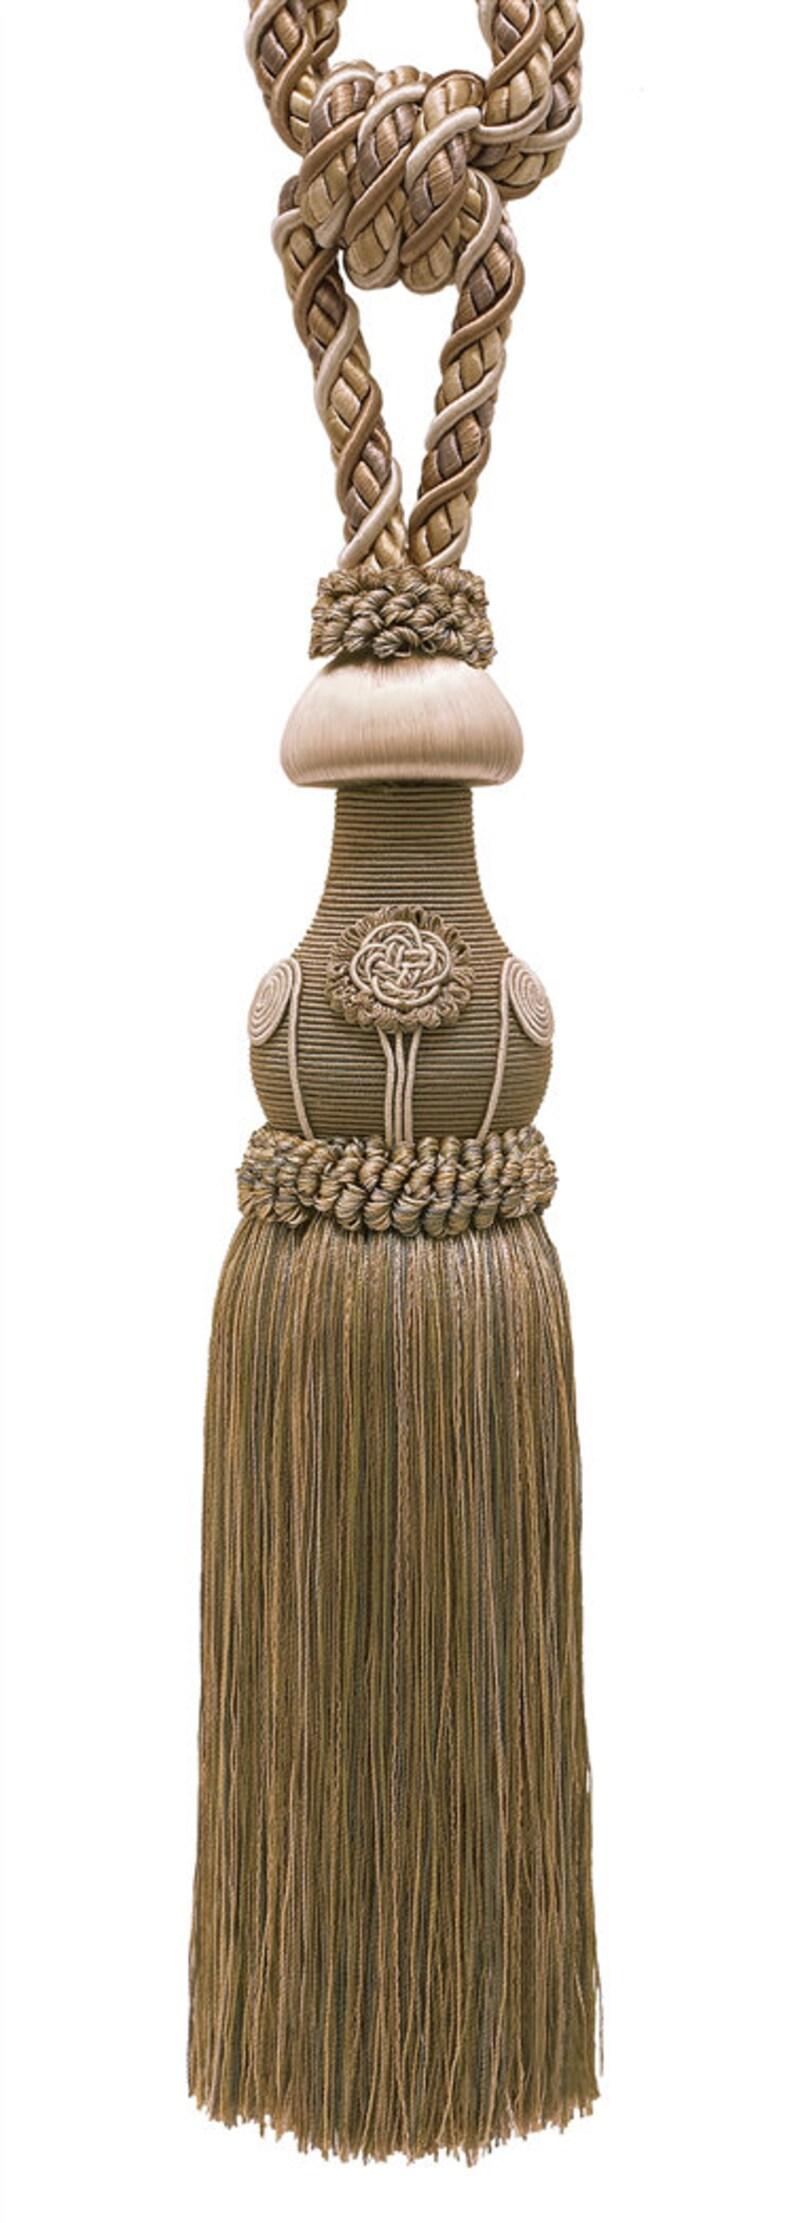 Decorative Beige Multi Tone Curtain /& Drapery Tassel Tieback 12 tassel 716 Cord embrace Baroque Coll 32 Spread